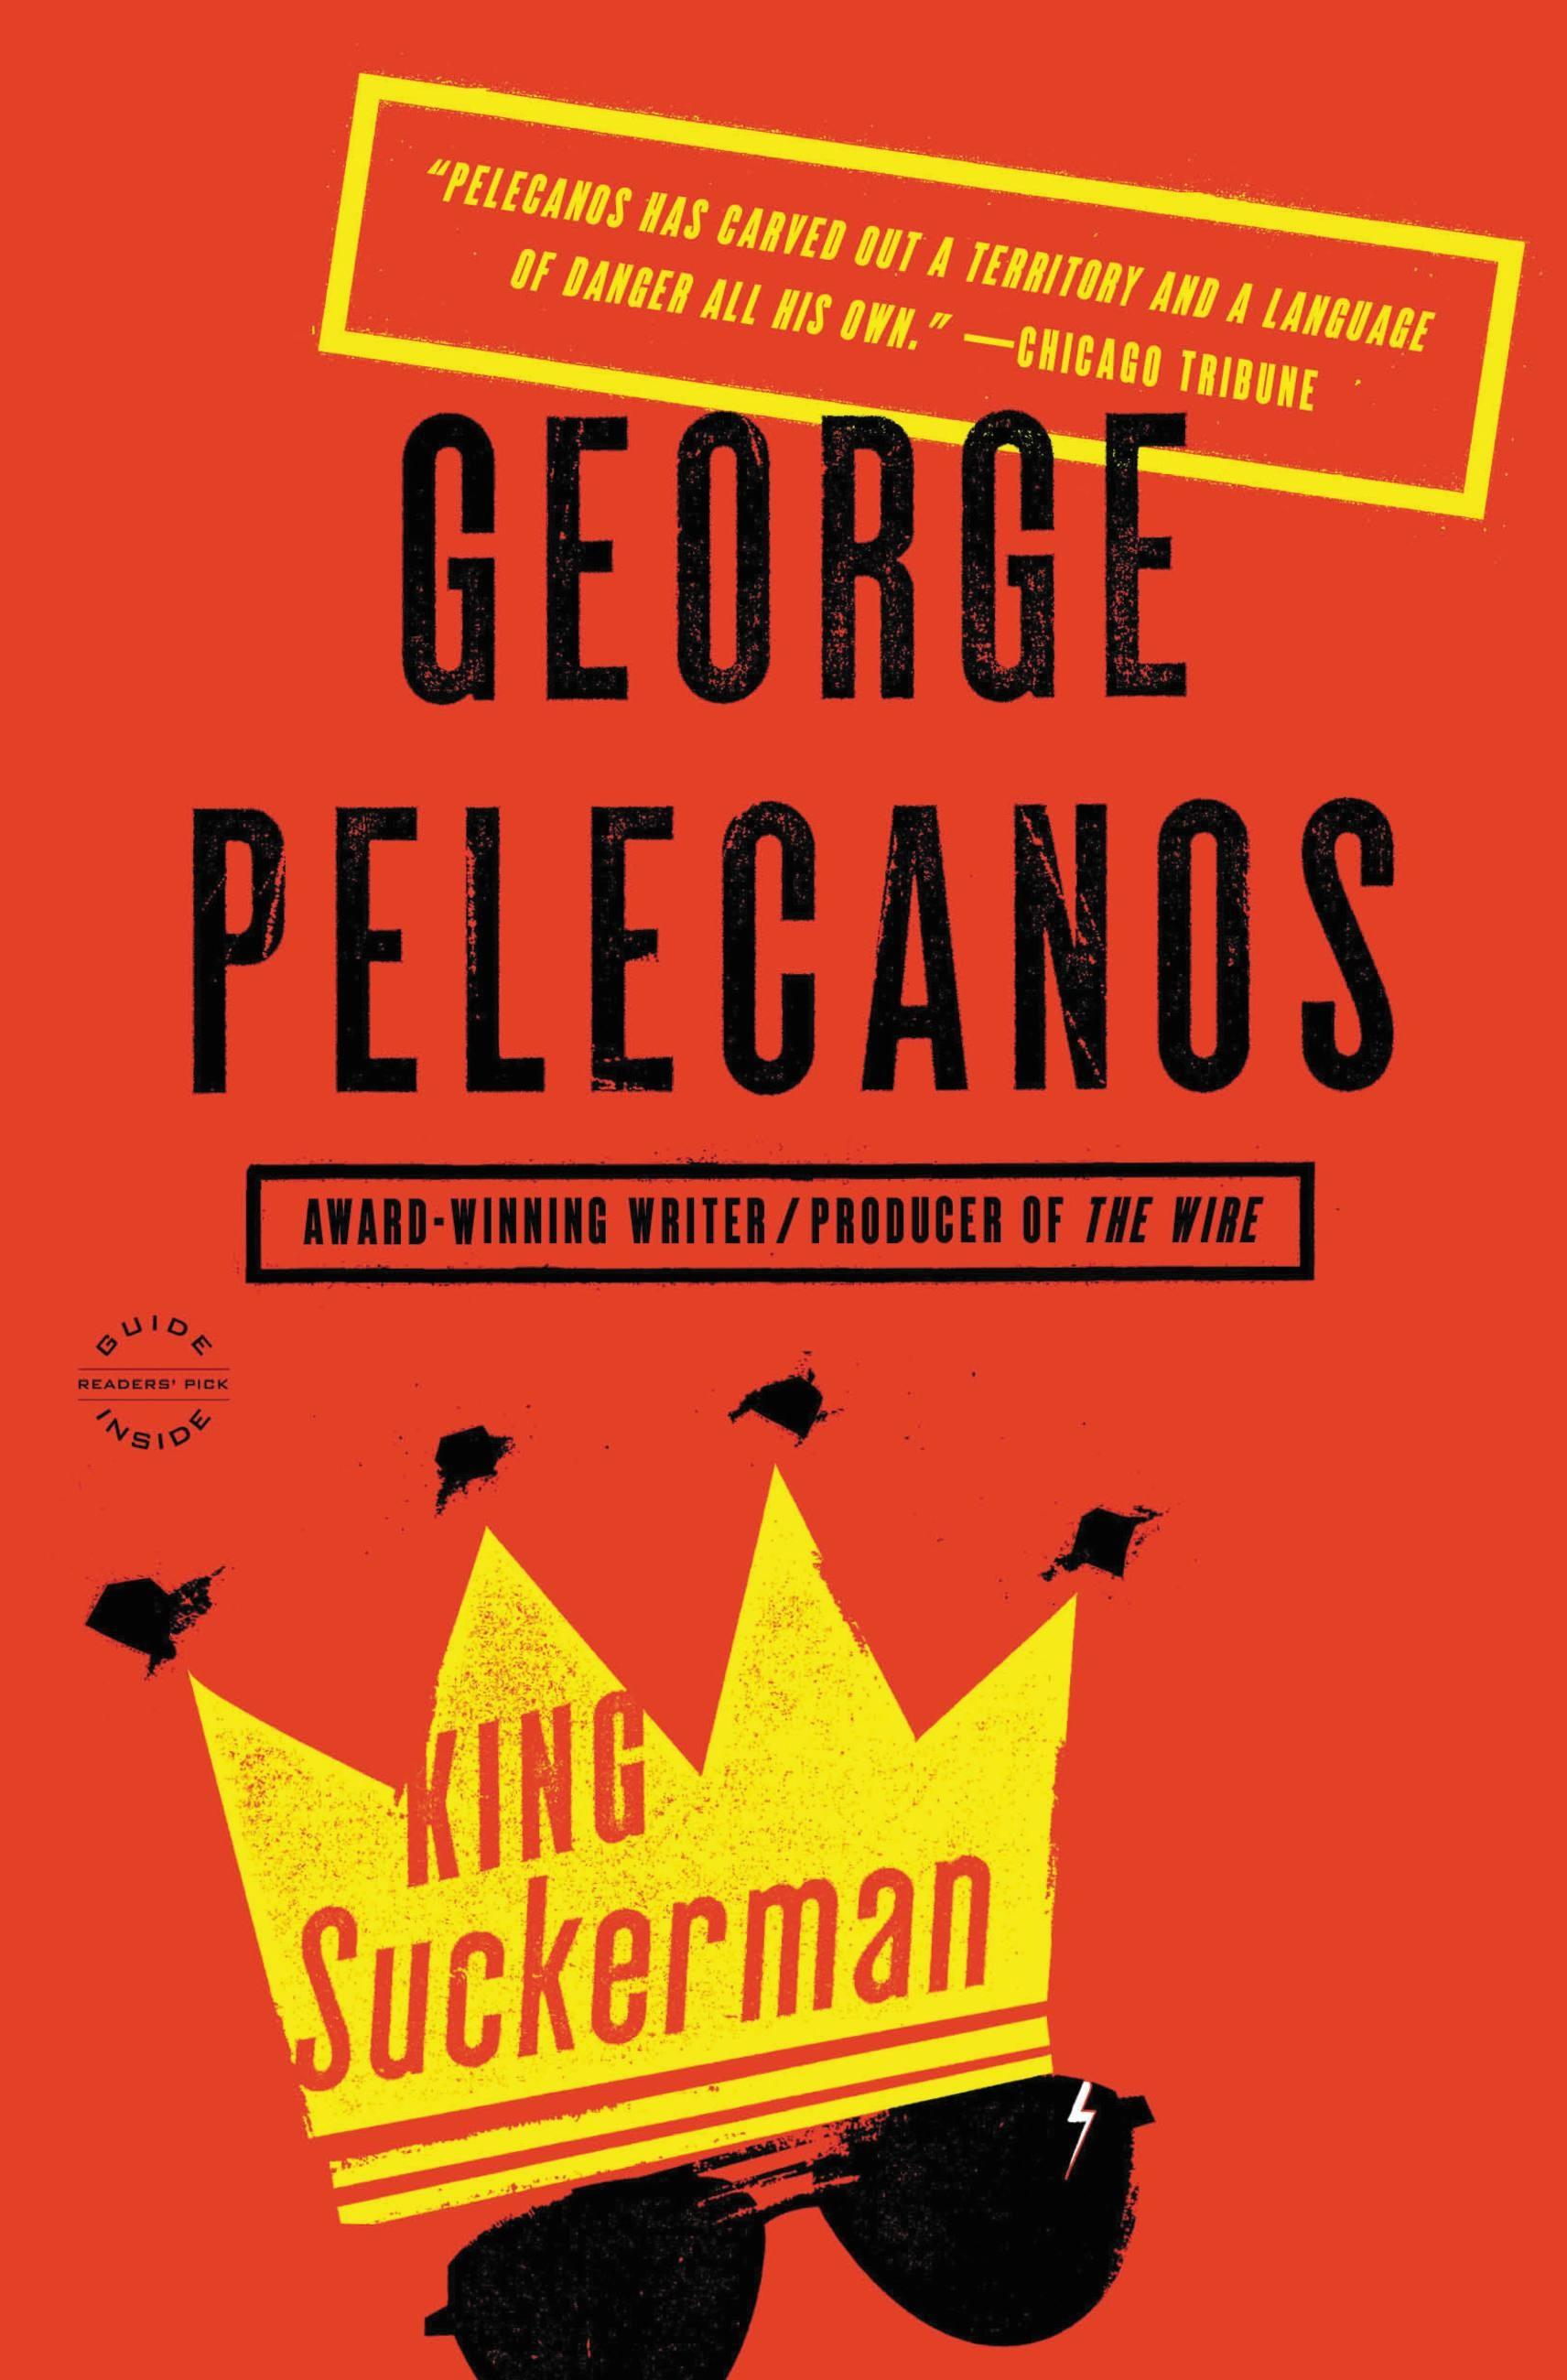 King Suckerman by George P. Pelecanos | Hachette Book Group